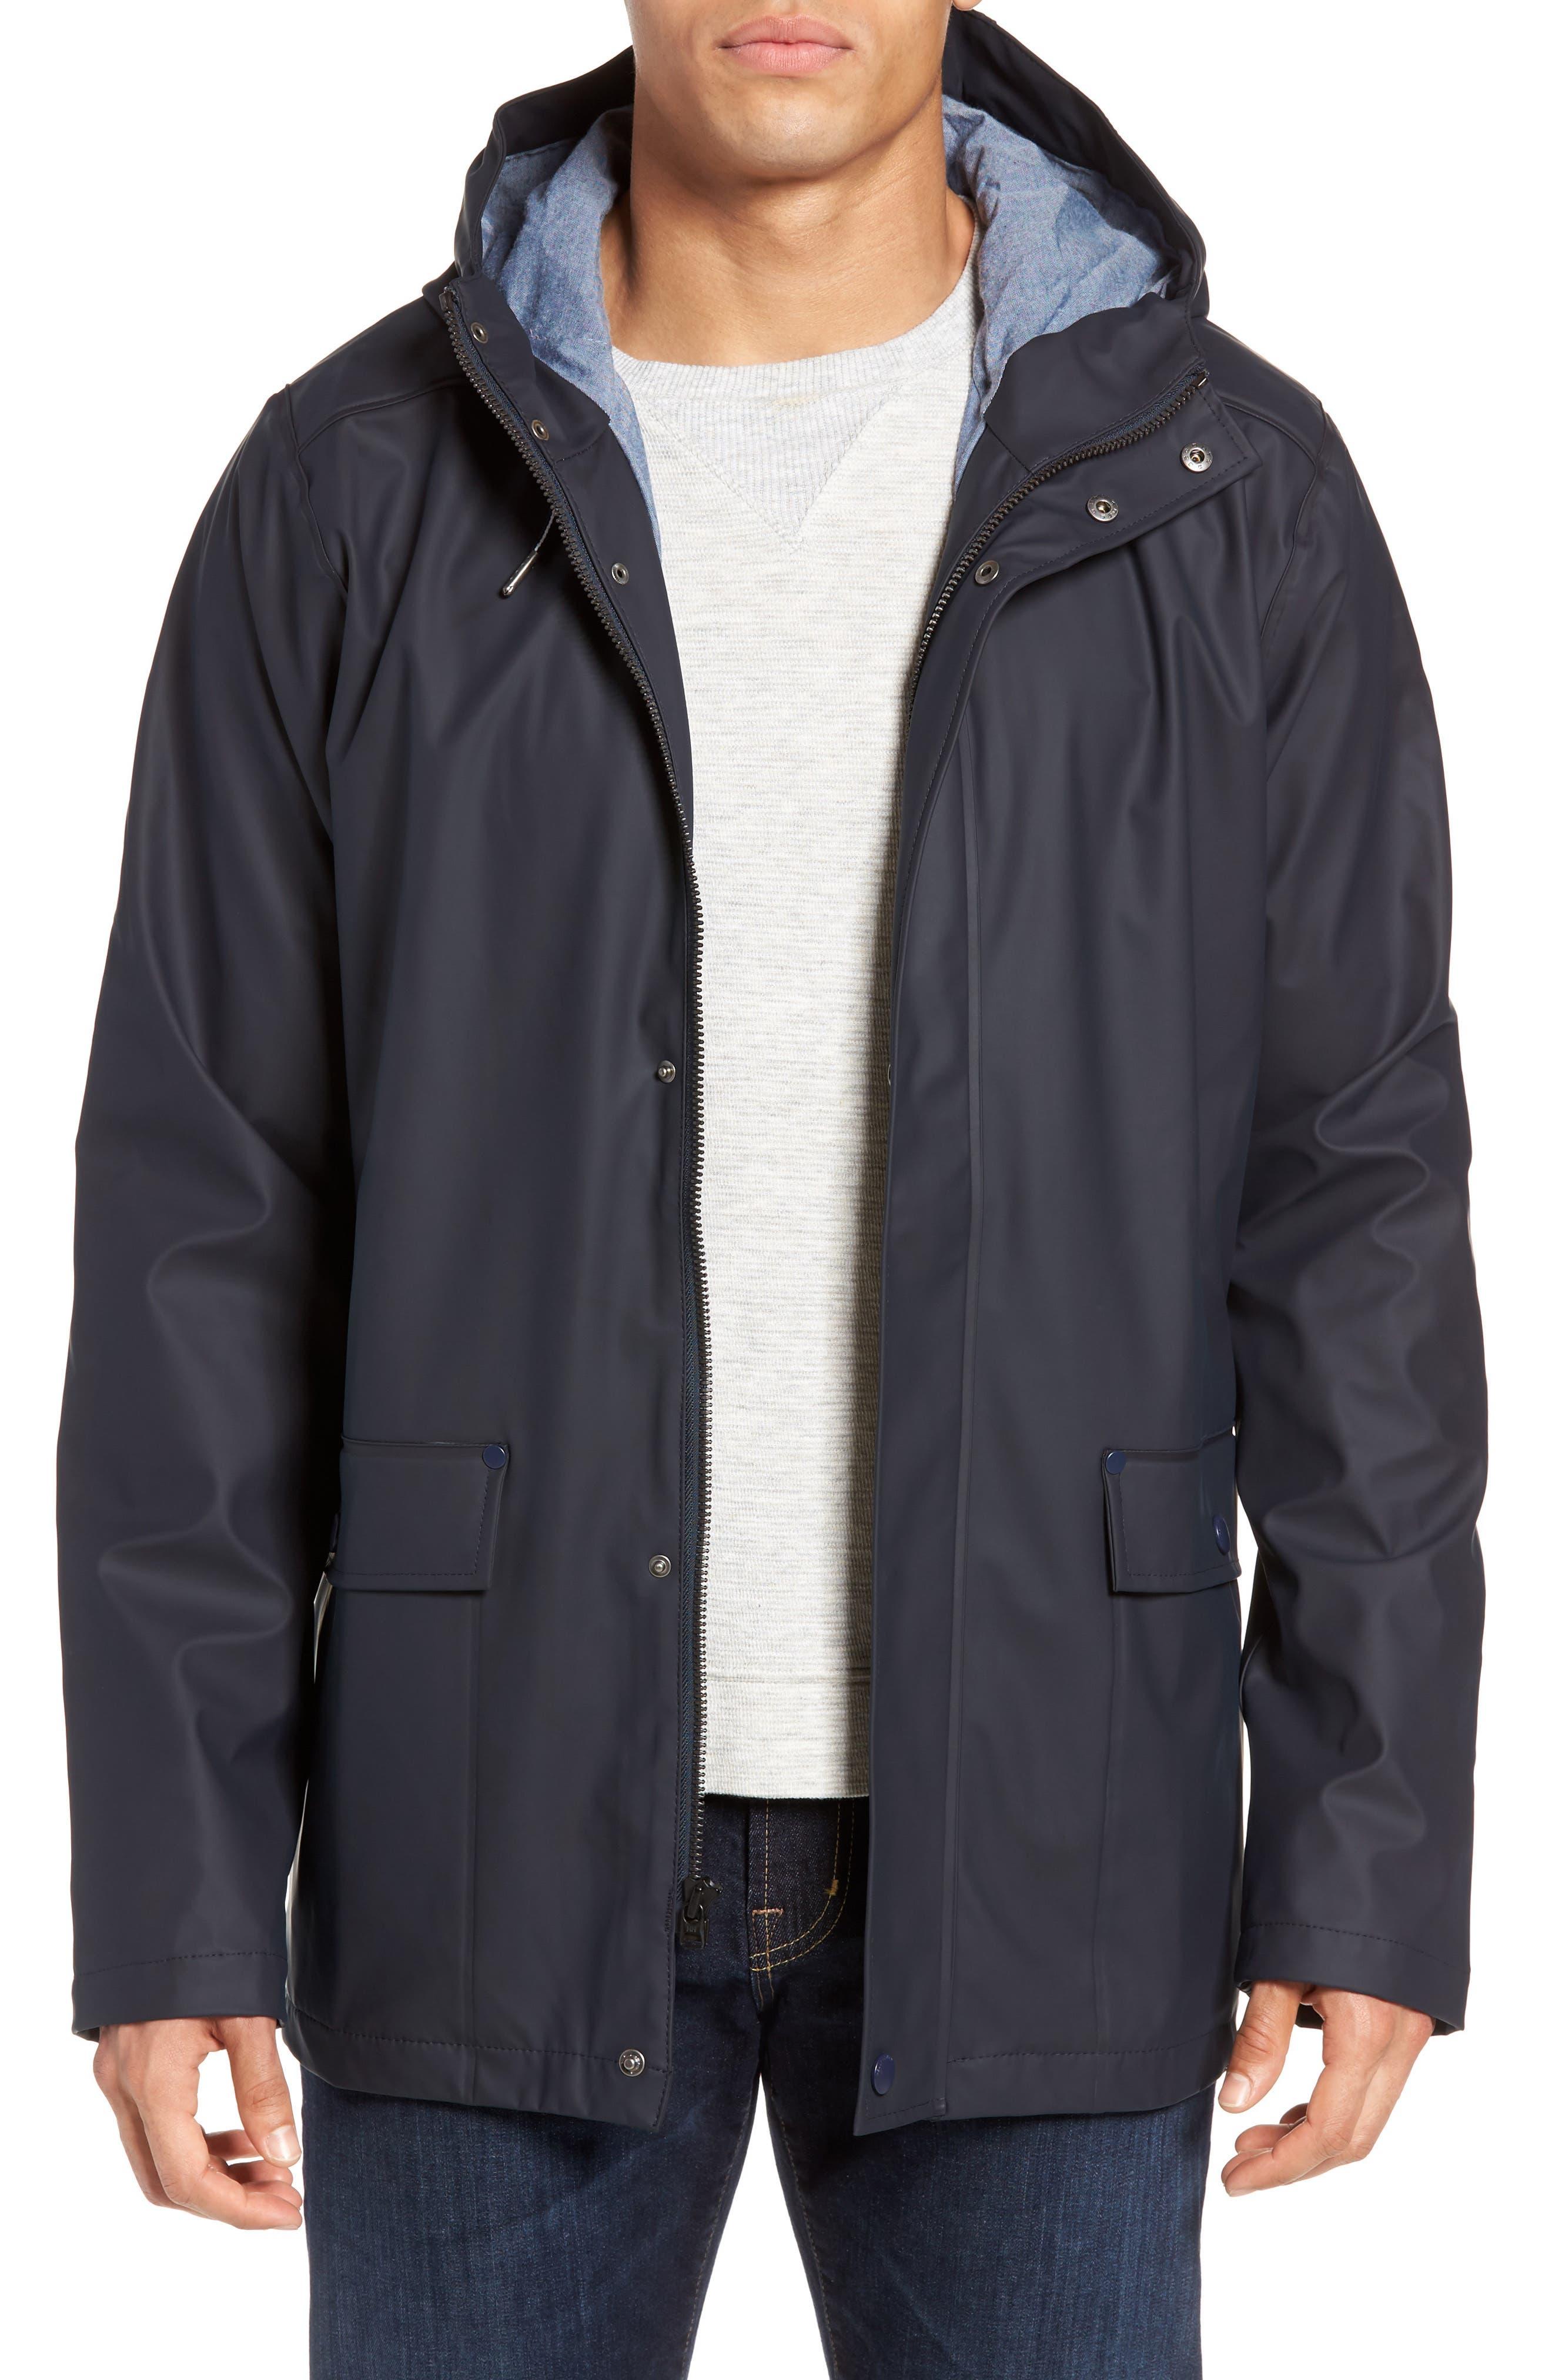 Helly Hansen Lerwick Raincoat